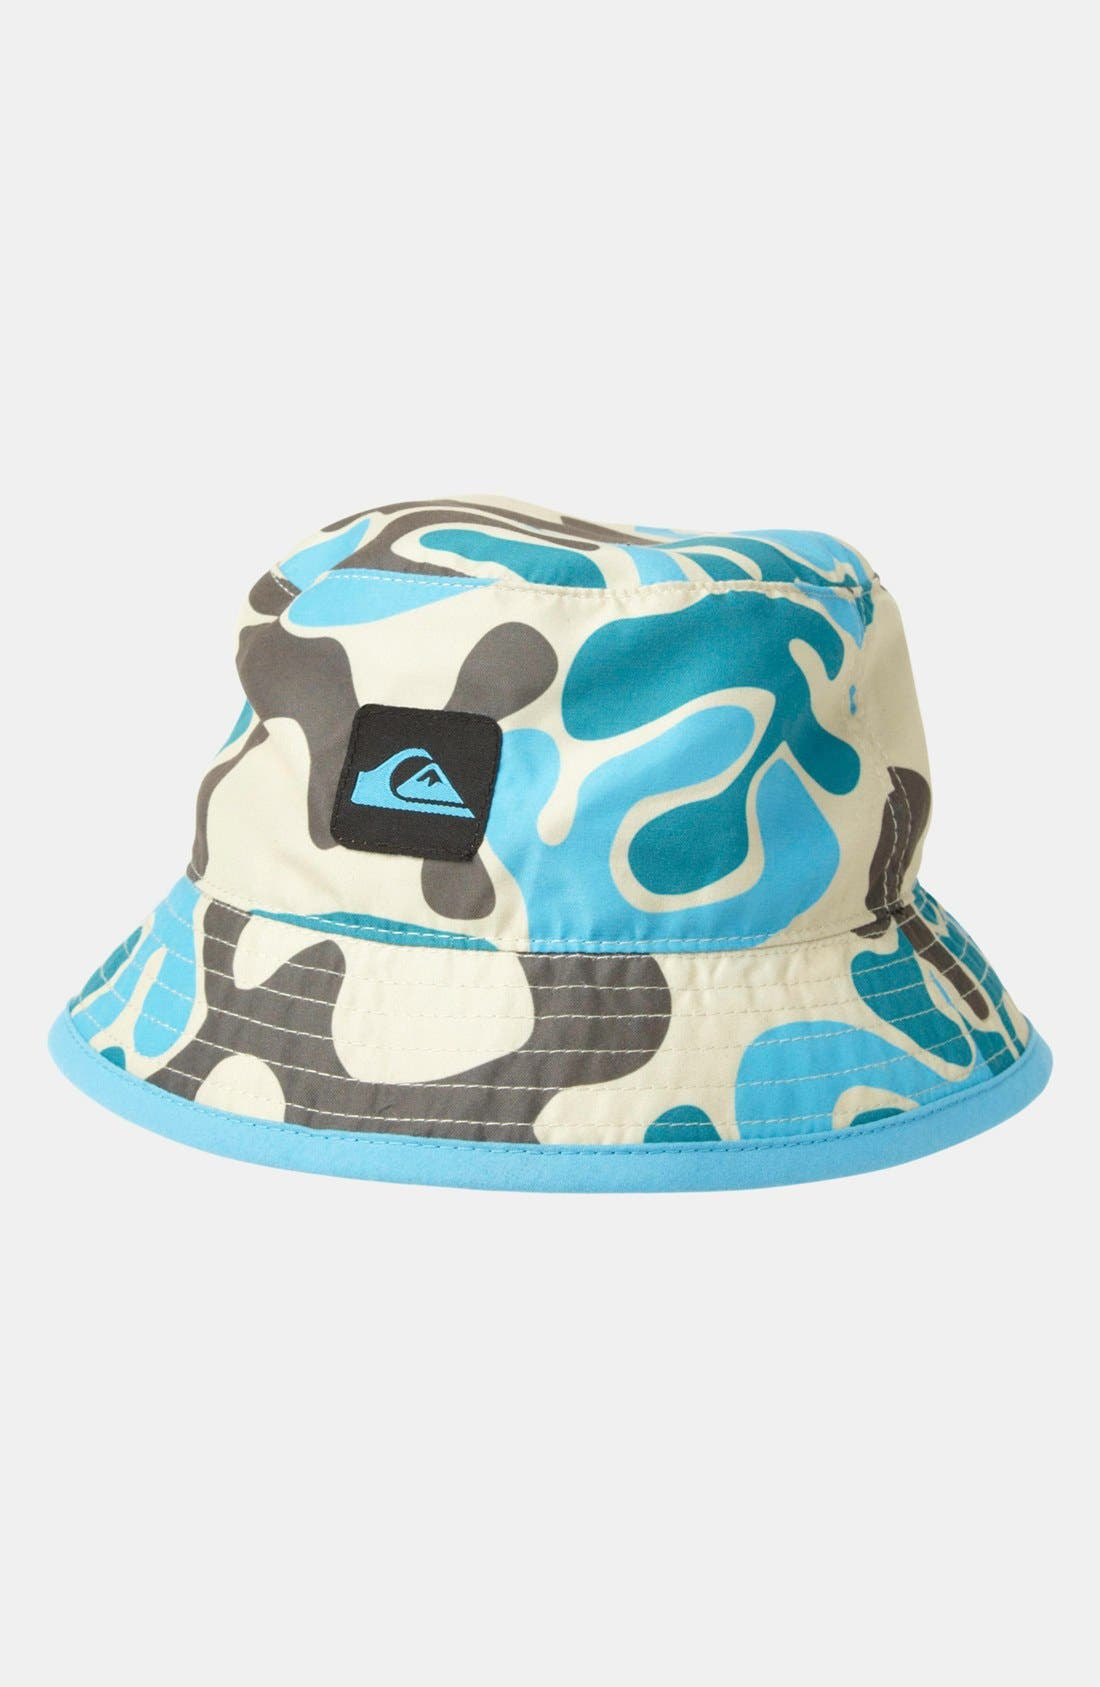 Alternate Image 1 Selected - Quiksilver 'Grommet' Bucket Hat (Toddler Boys)